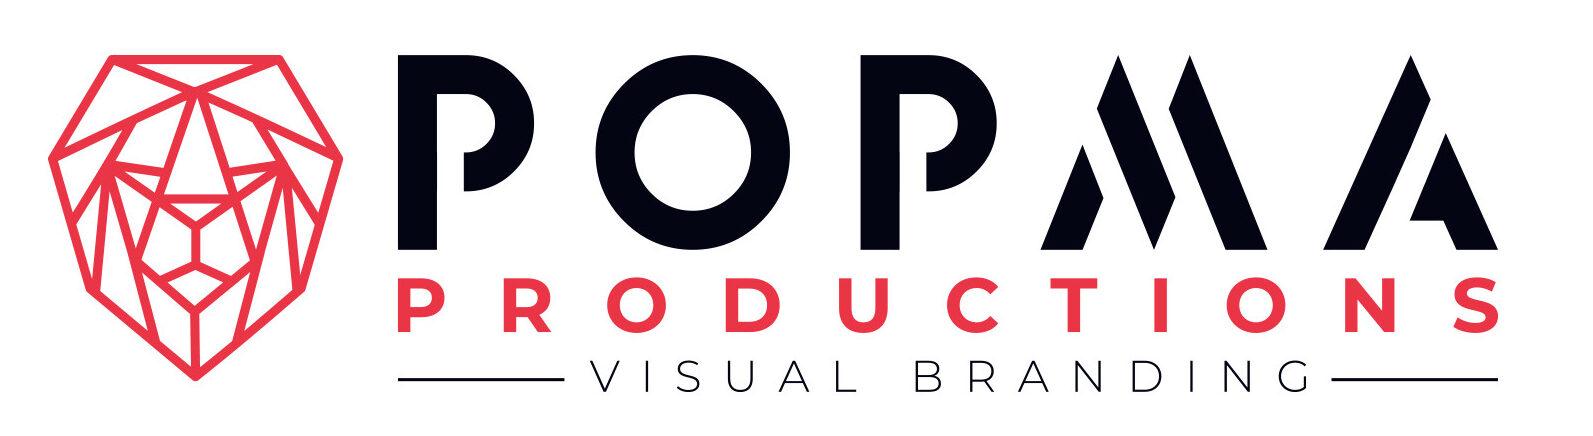 Popma productions logo